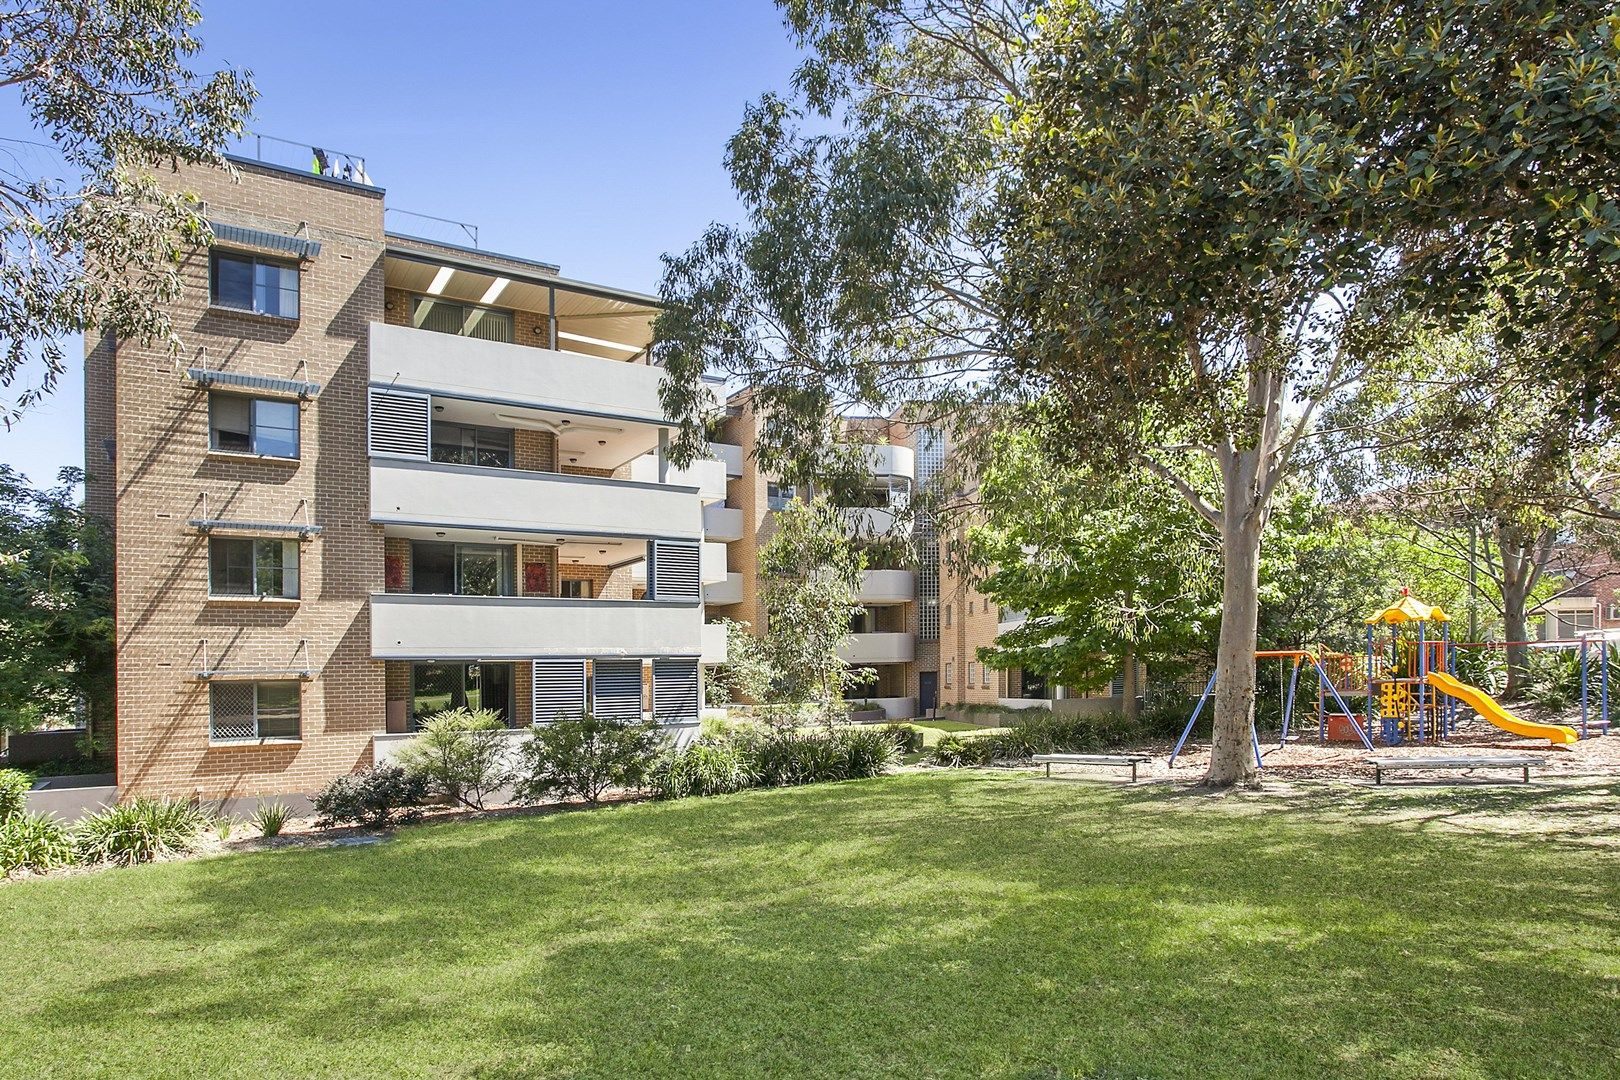 24/18-22 Gray Street, Sutherland NSW 2232, Image 0